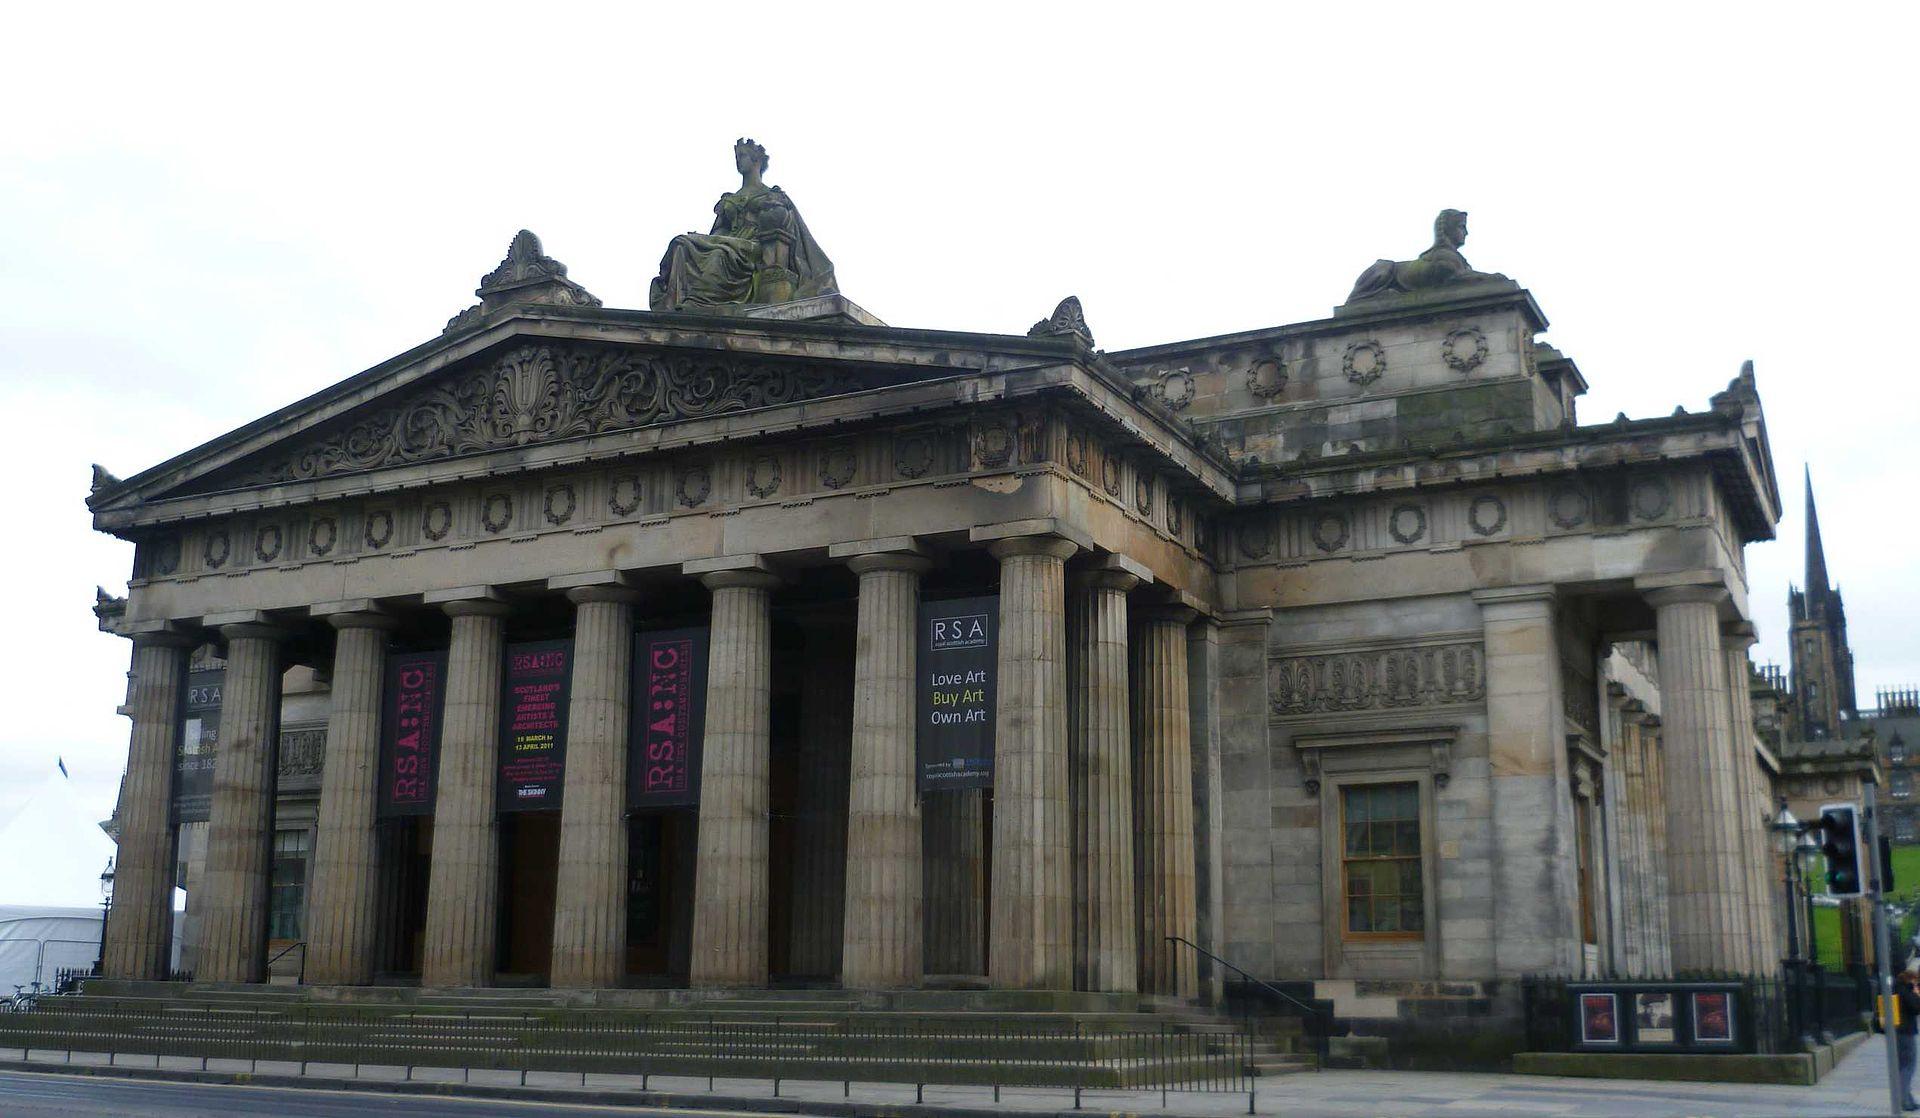 Royal_Scottish_Academy_on_the_Mound,_Edinburgh